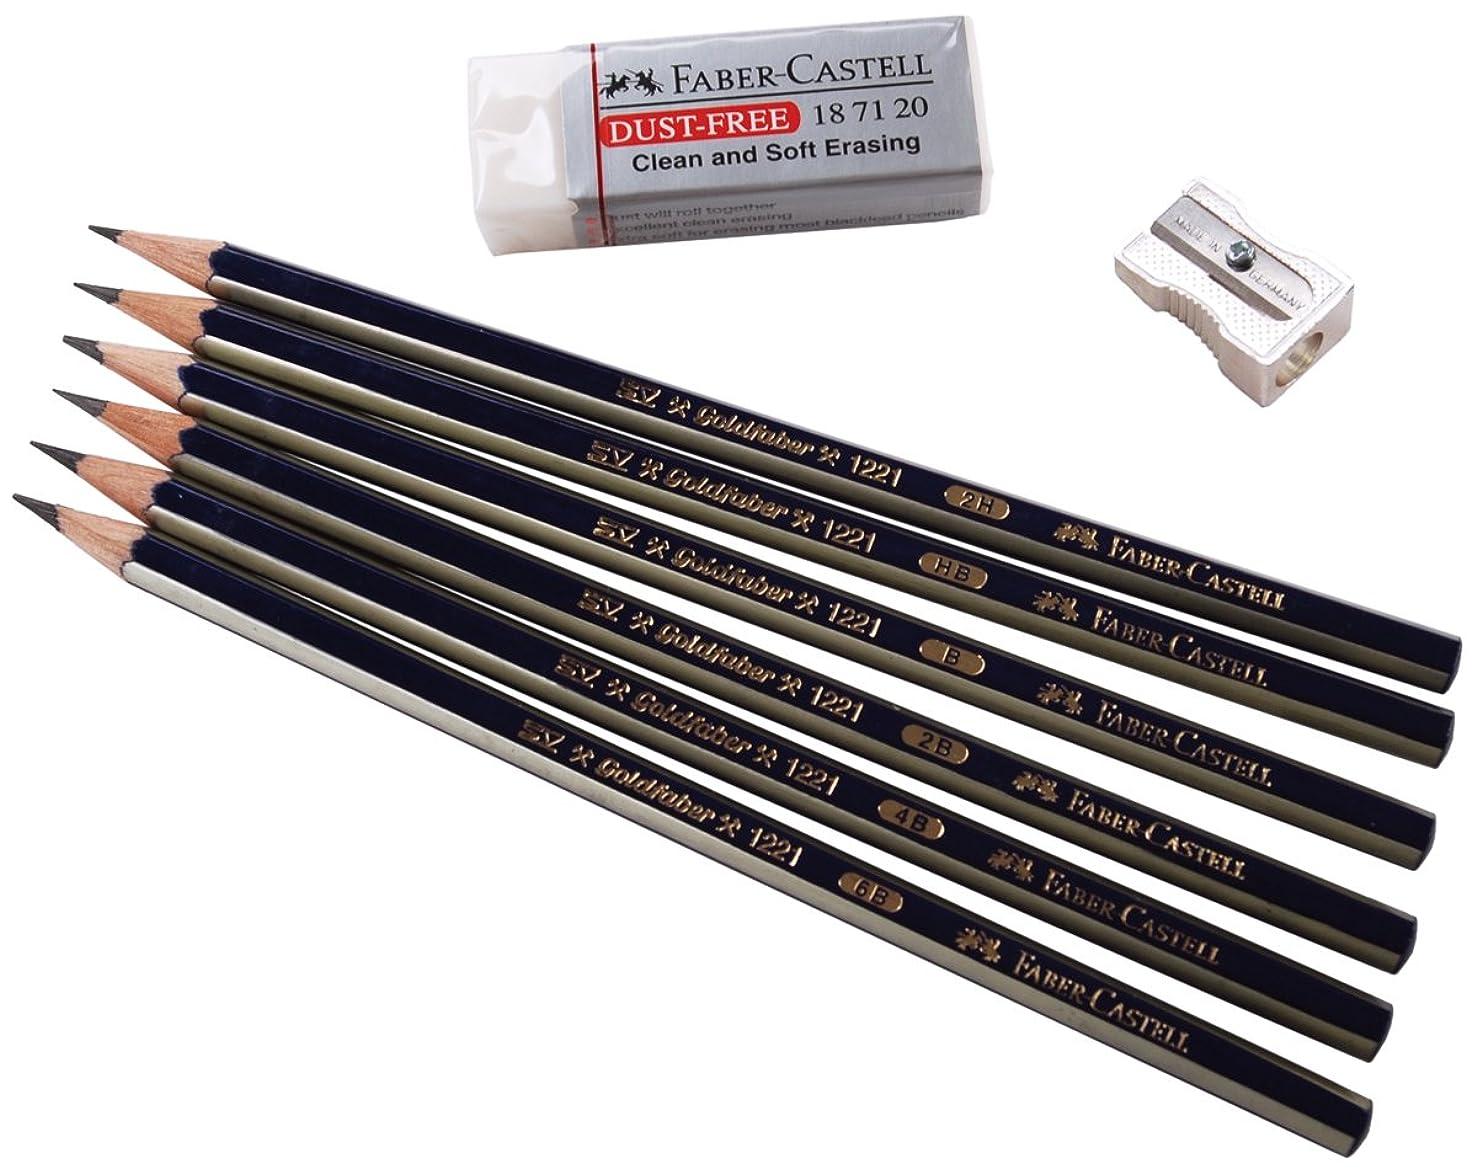 Faber-Castel 114000 8-Piece Creative Studio Graphite Sketch Set, 2H, HB, B, 2B, 4B and 6B